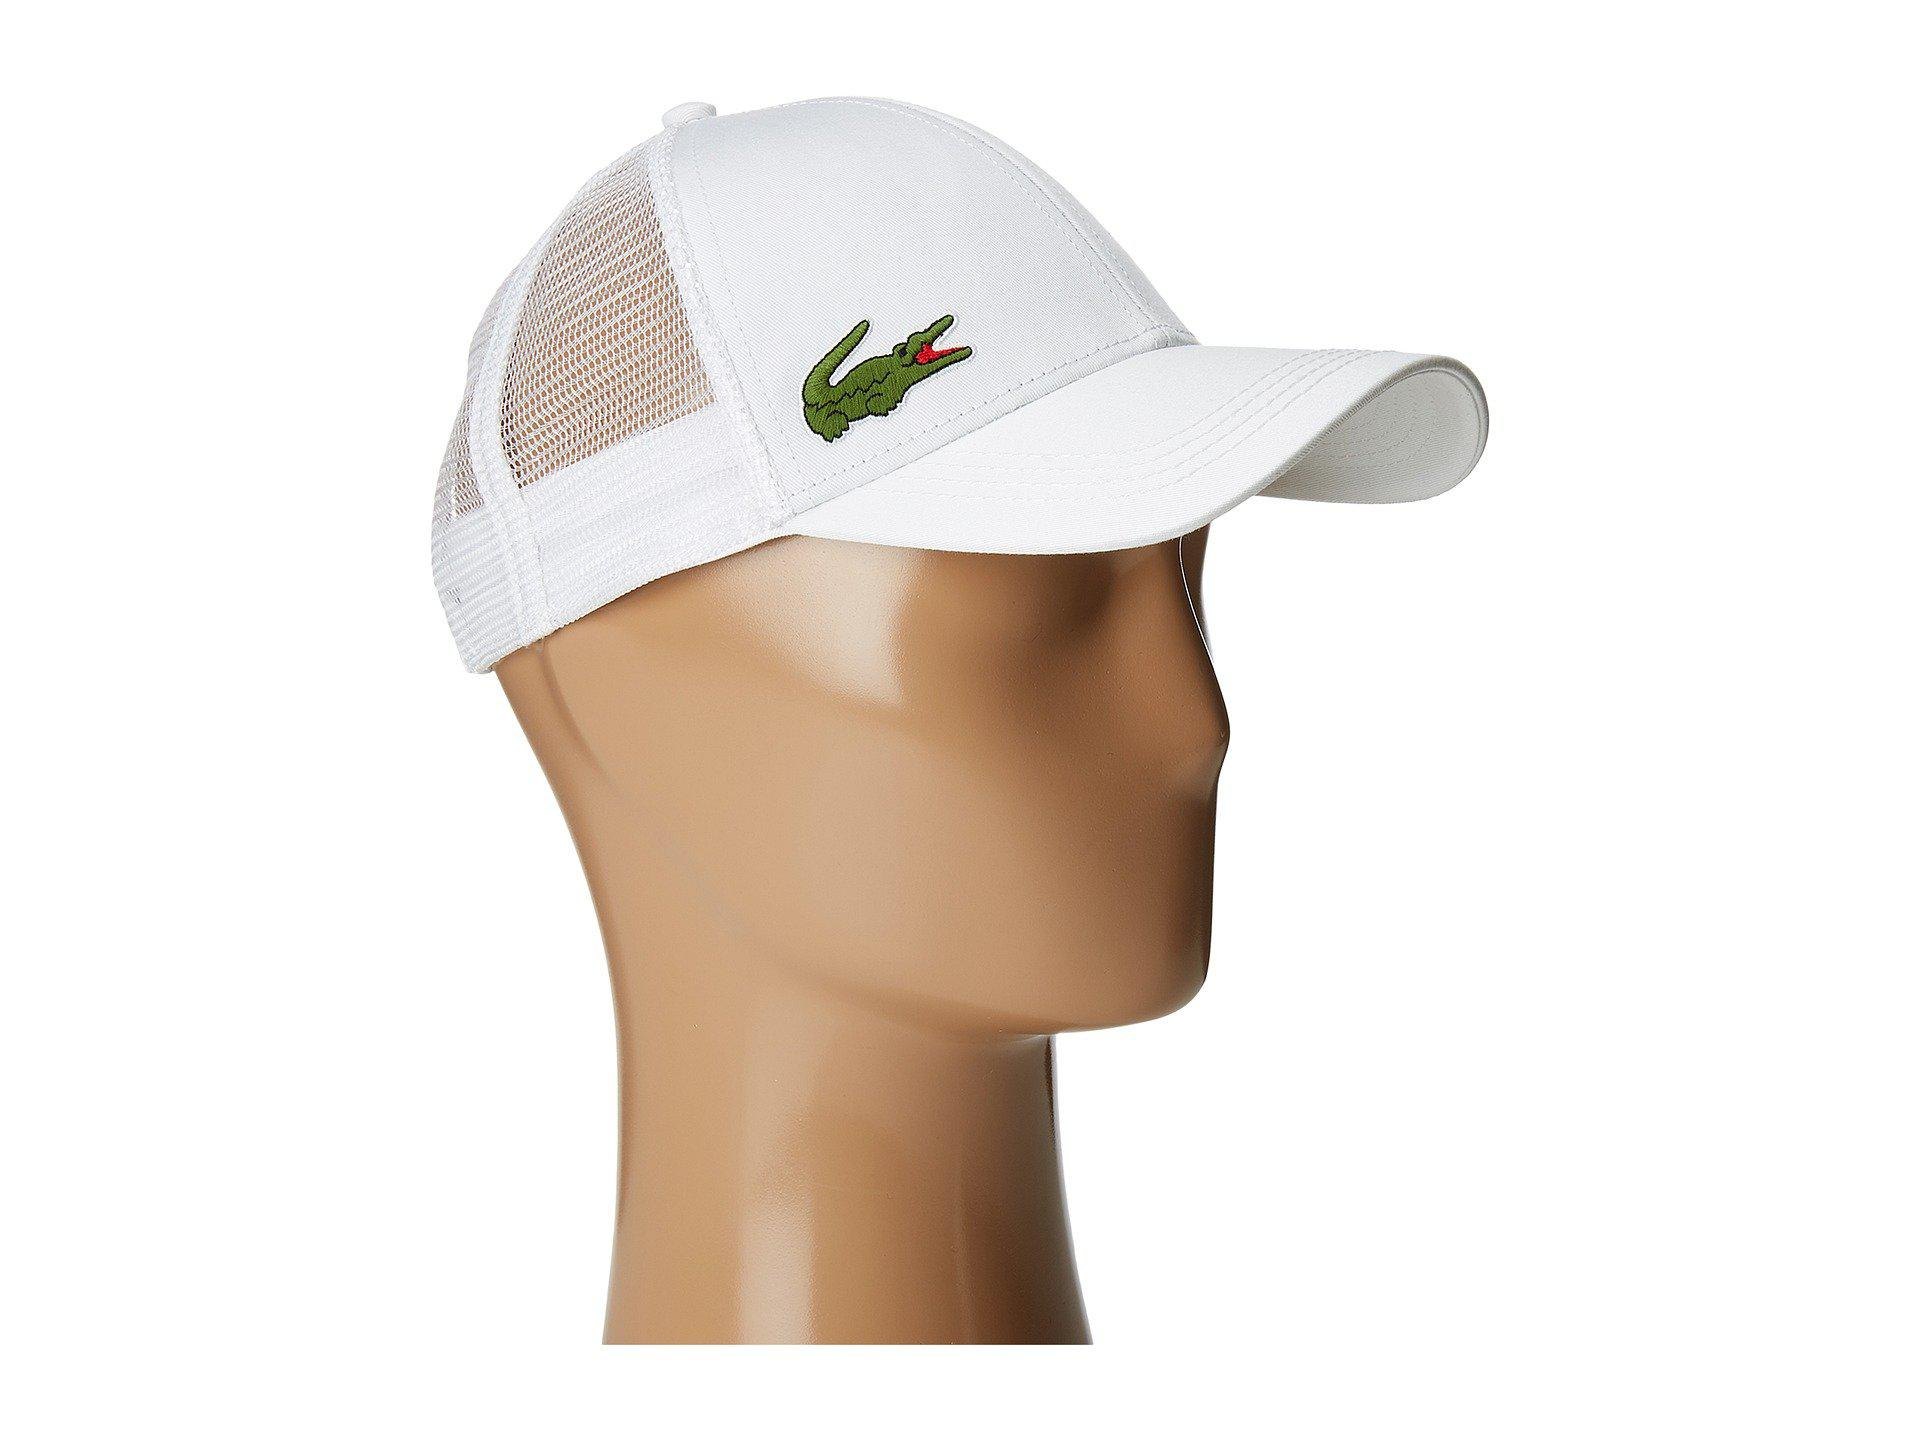 3d84d2f4ebcc37 Lacoste Classic 5cm Croc Trucker Hat in White for Men - Lyst